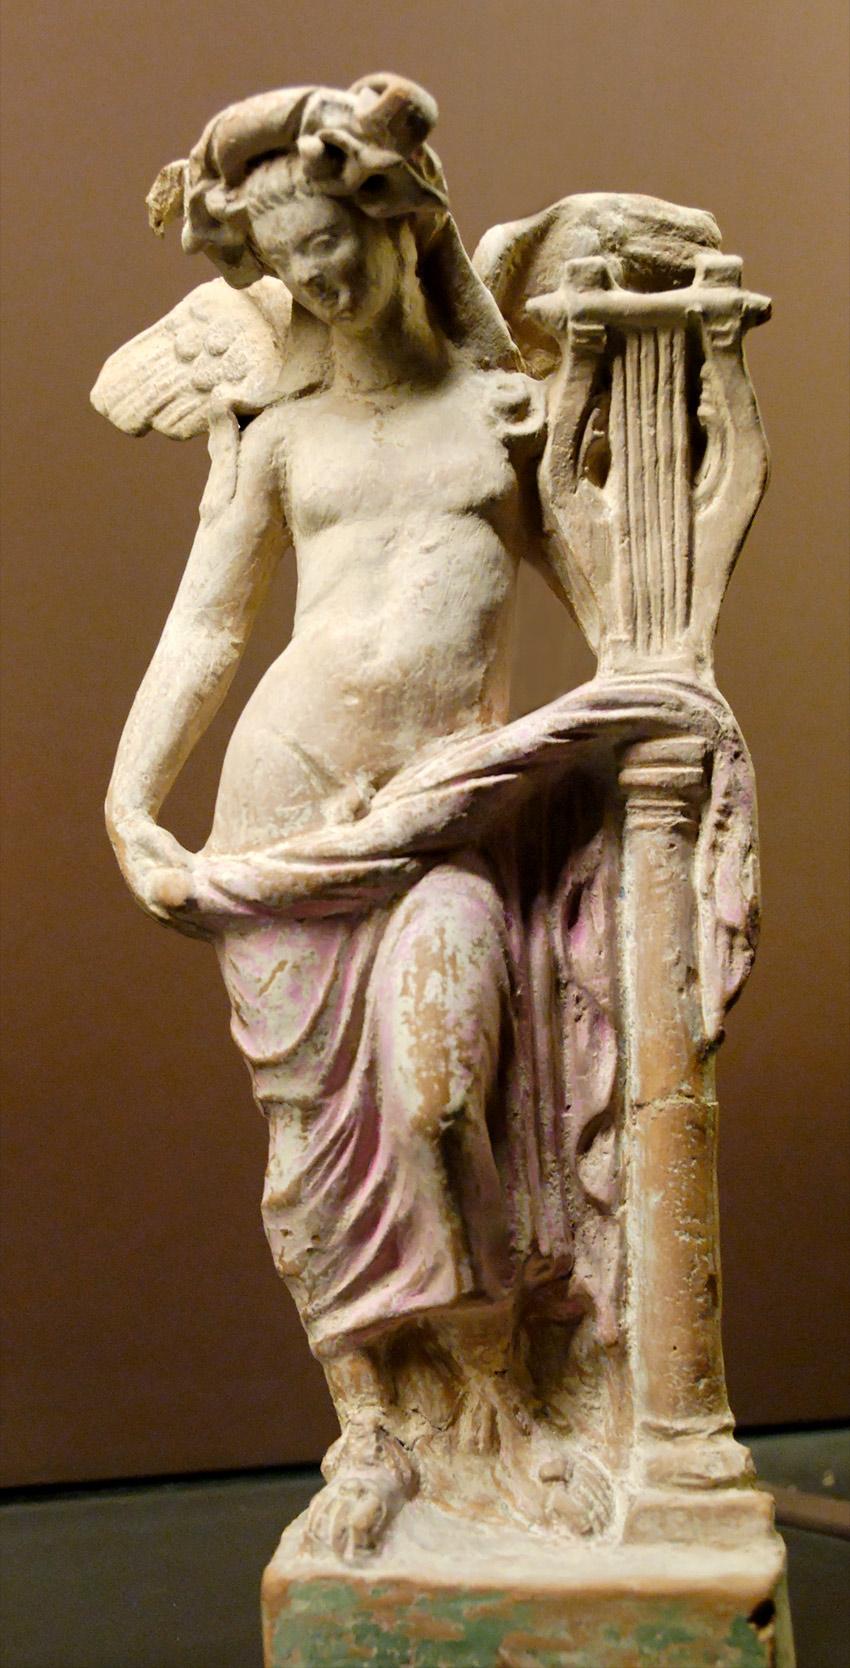 statue of eros sleeping 3rd century jpg 422x640